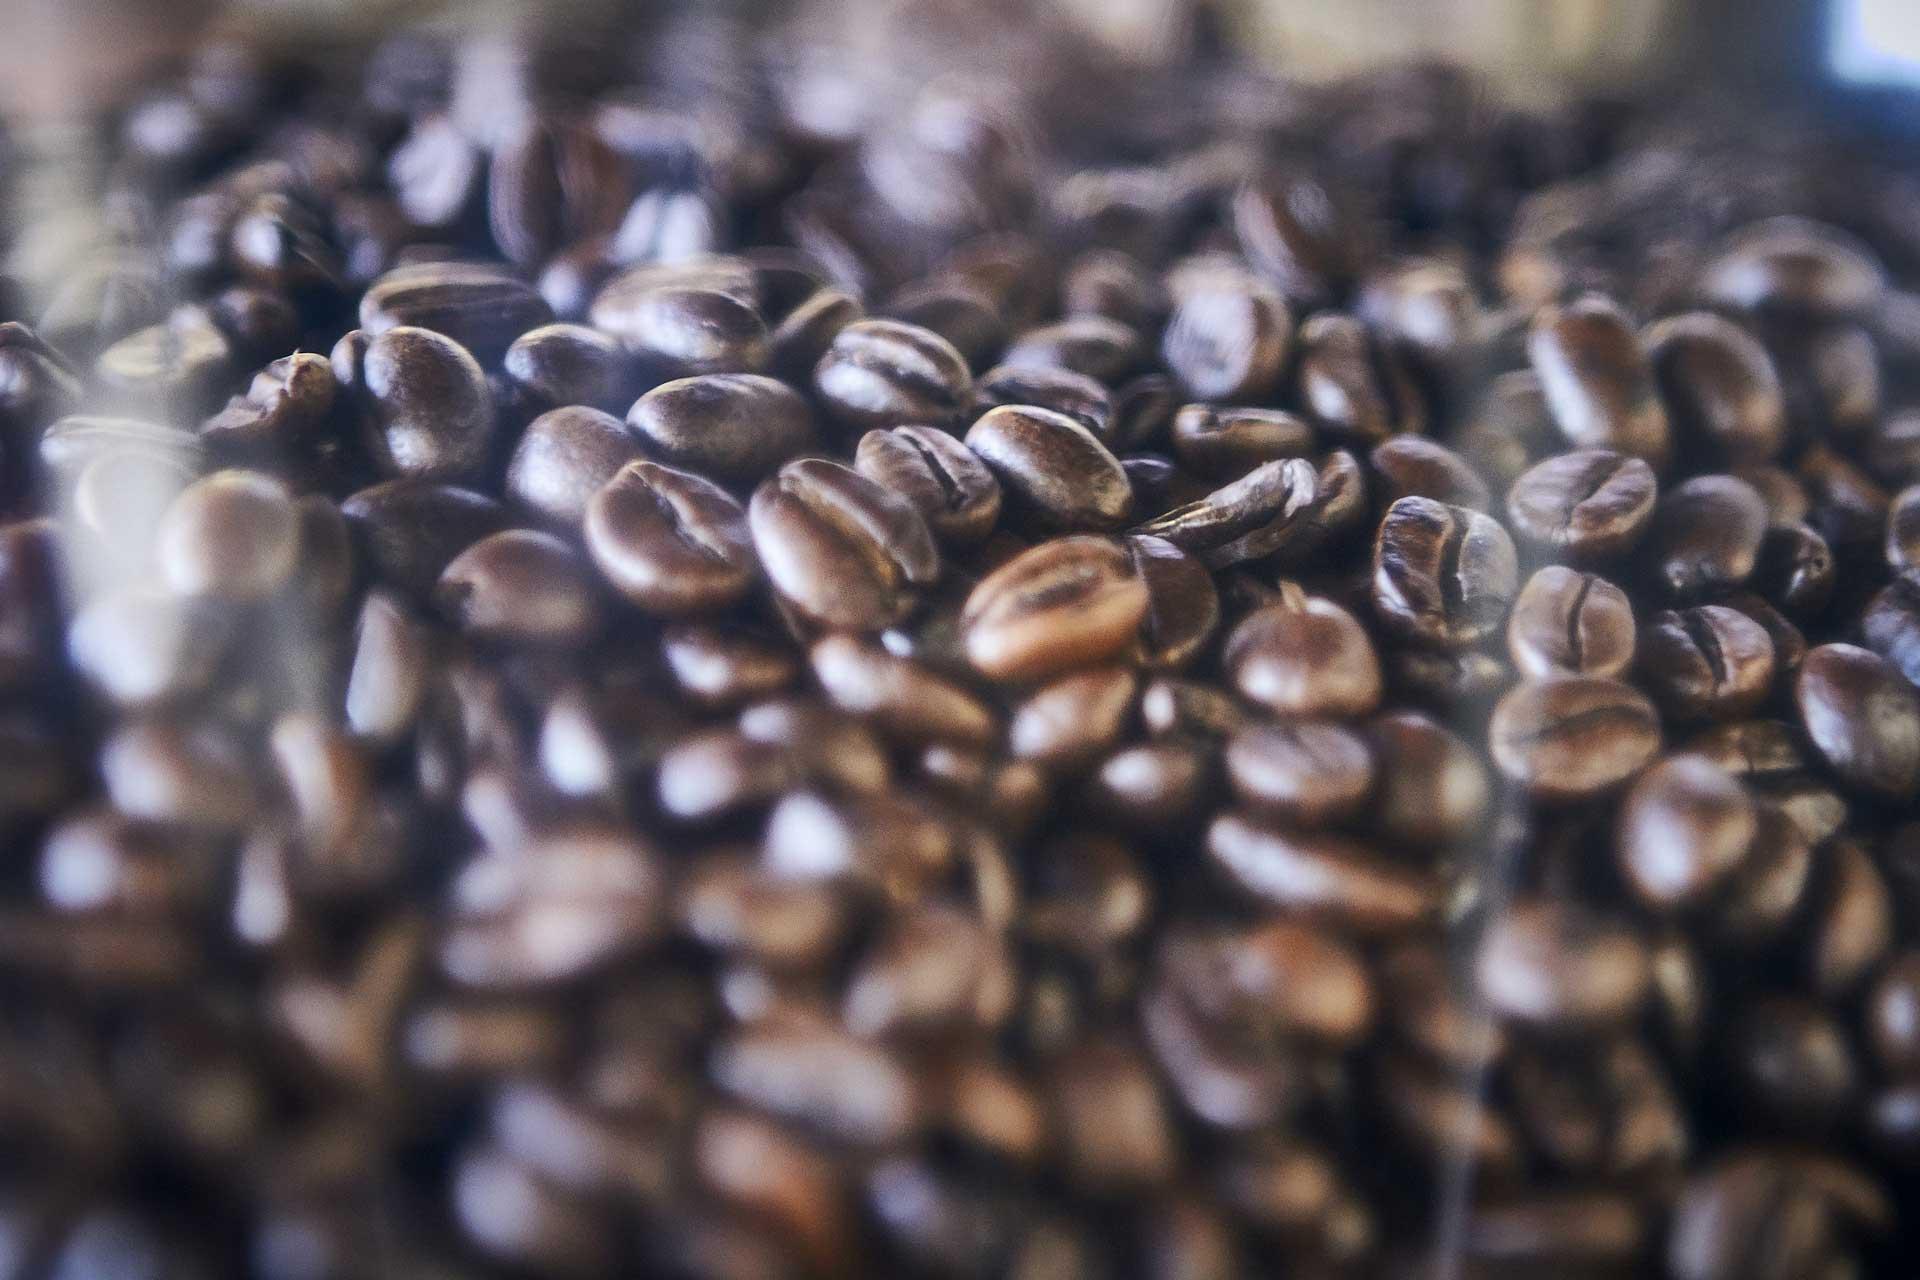 caffe_valiani_1831_pistoia_02